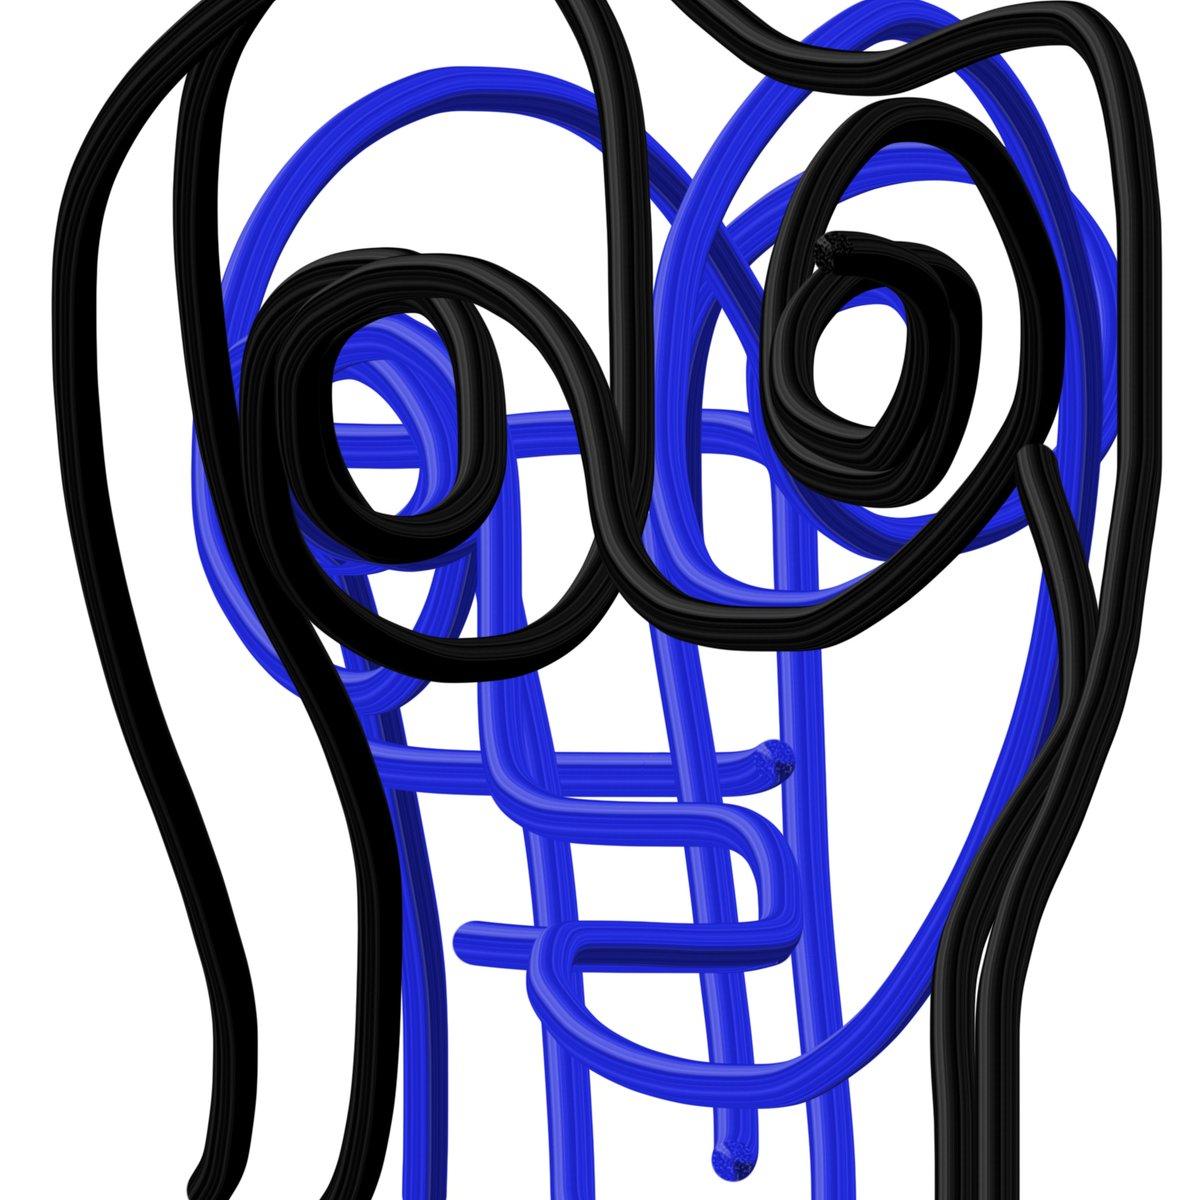 #ibiza #electro #techno #club #テクノ #art #popart #芸術 #絵 #soundcloud #music #beatport #itunes  #絵画 #アート #写真 #photo #spotify #東京 #大阪 #福岡  #Apple Music   #youtube  #gitaro #AWA  #LINE MUSIC #Amazon #都田テクノ